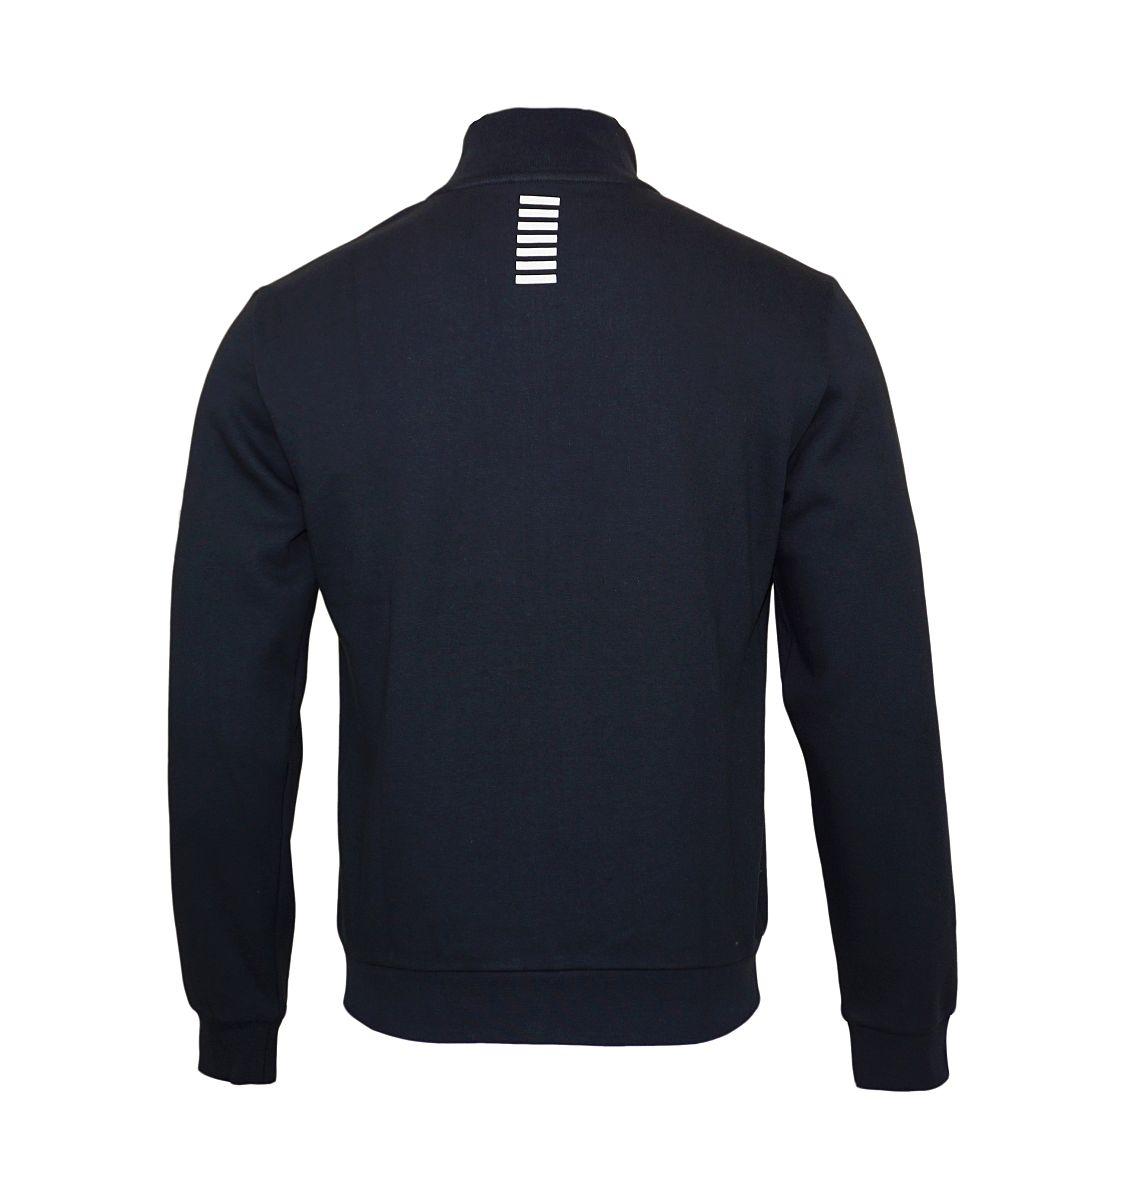 EA7 Emporio Armani Sweatshirt Trainingsjacke 6YPM55 PJ07Z 1578 Night Blue HW17-EATJ1